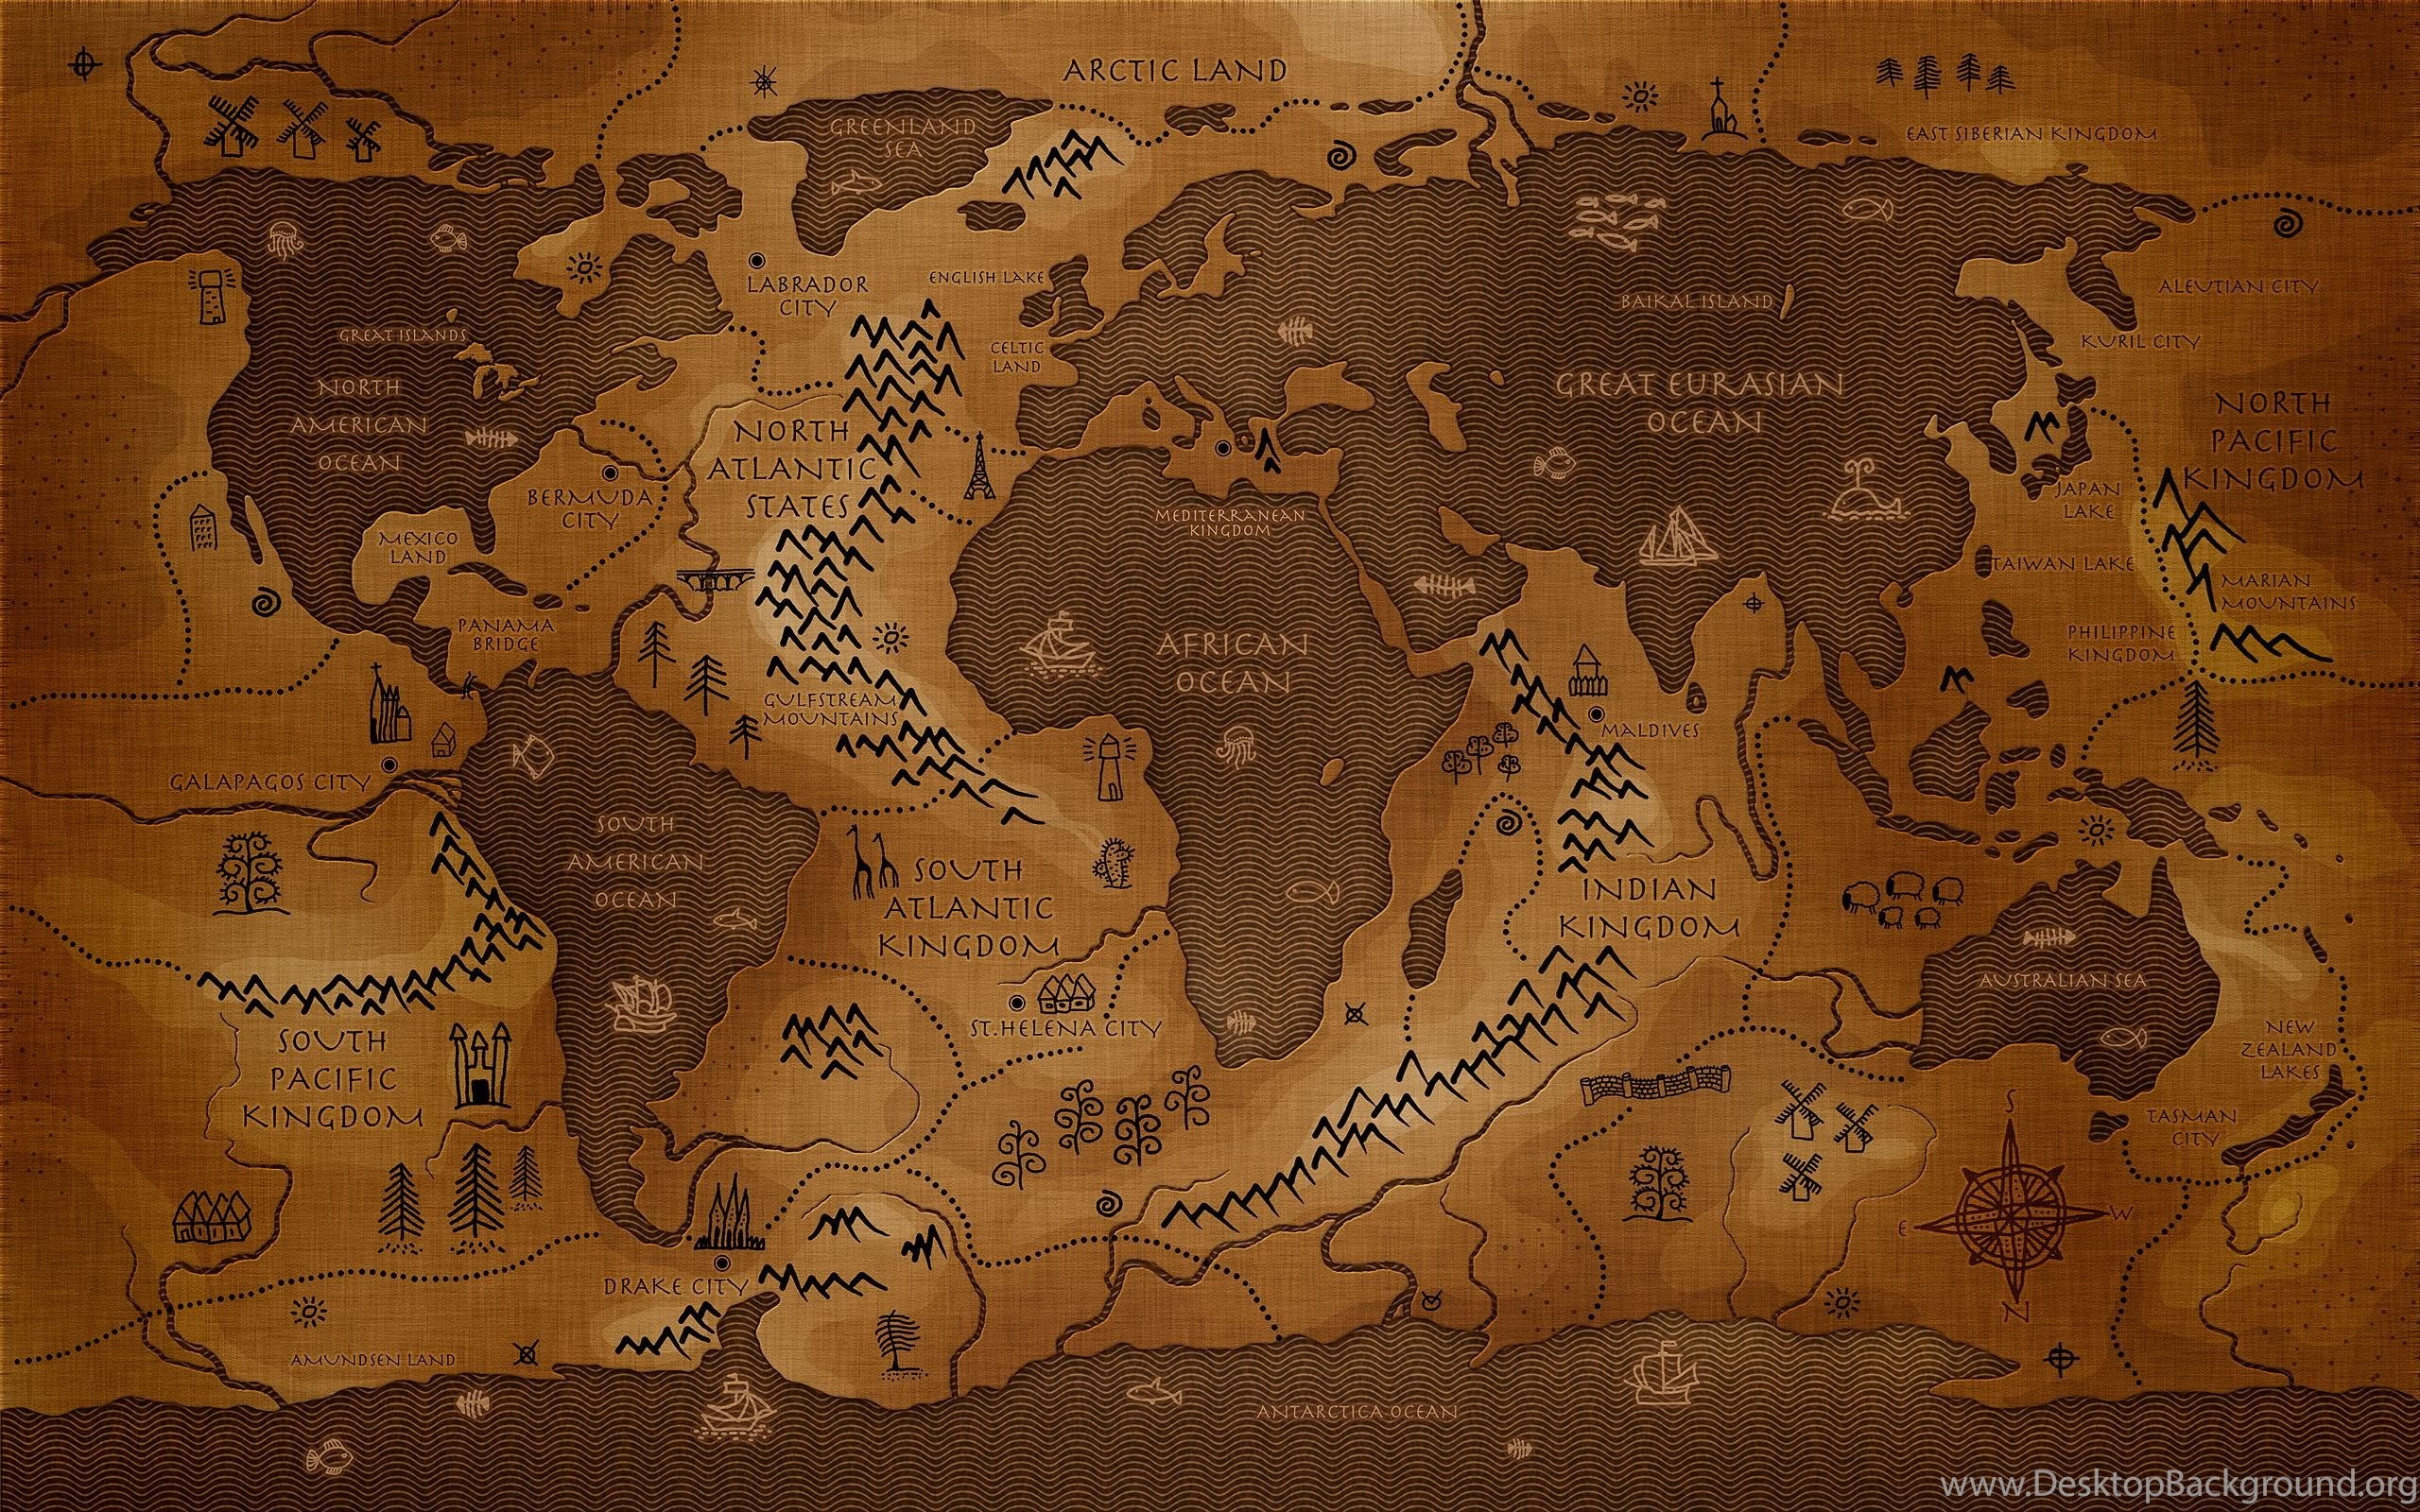 World map wallpapers desktop backgrounds desktop background original size 12mb gumiabroncs Choice Image